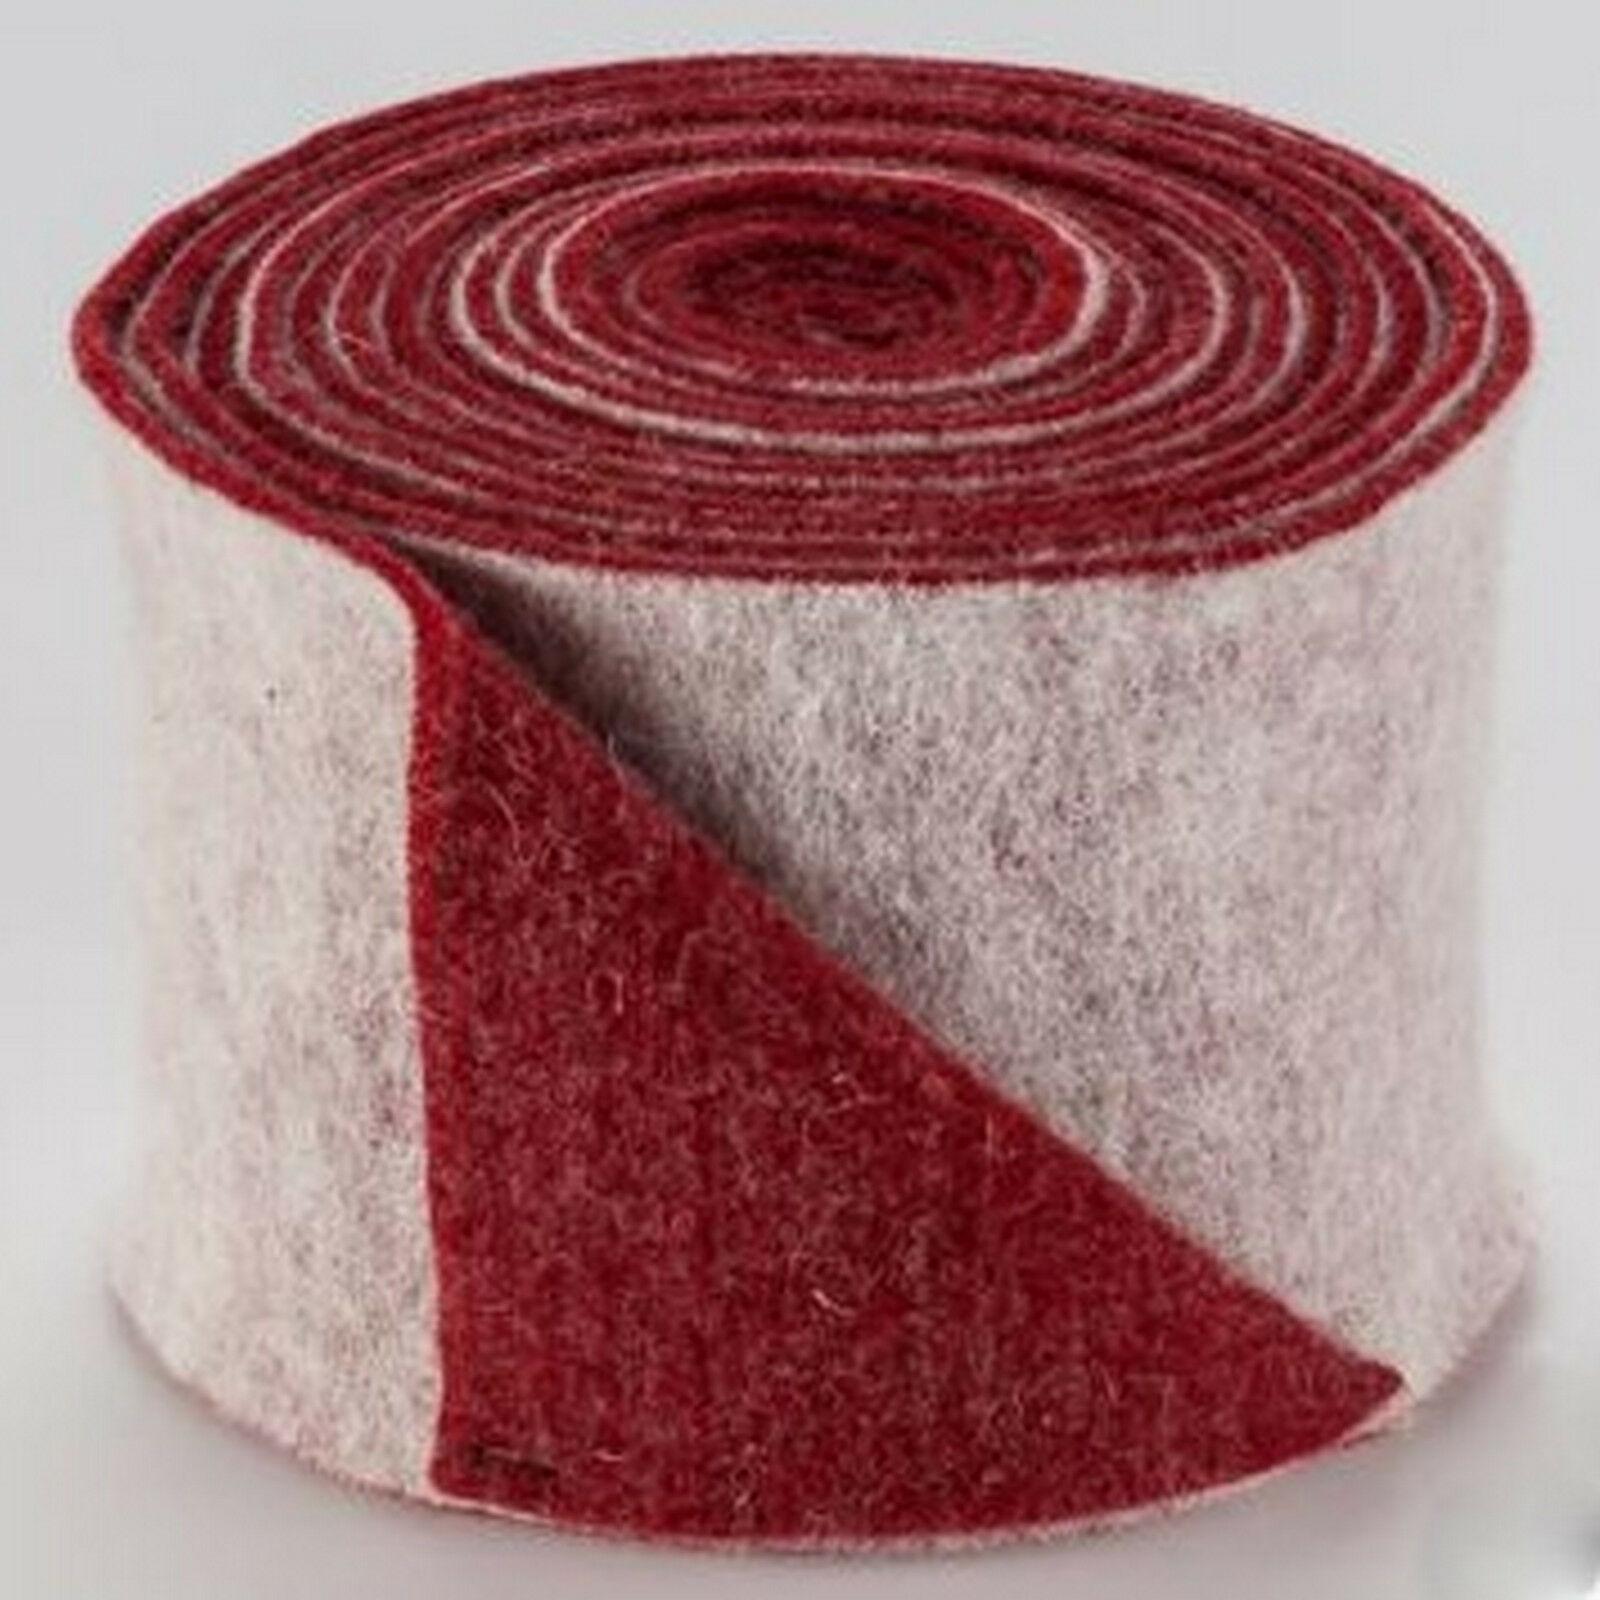 Topfband Filz 5 m x 15 cm zwei-farbige Dekoband Wollvlies Filz-Band Wollband  - weiß-rot